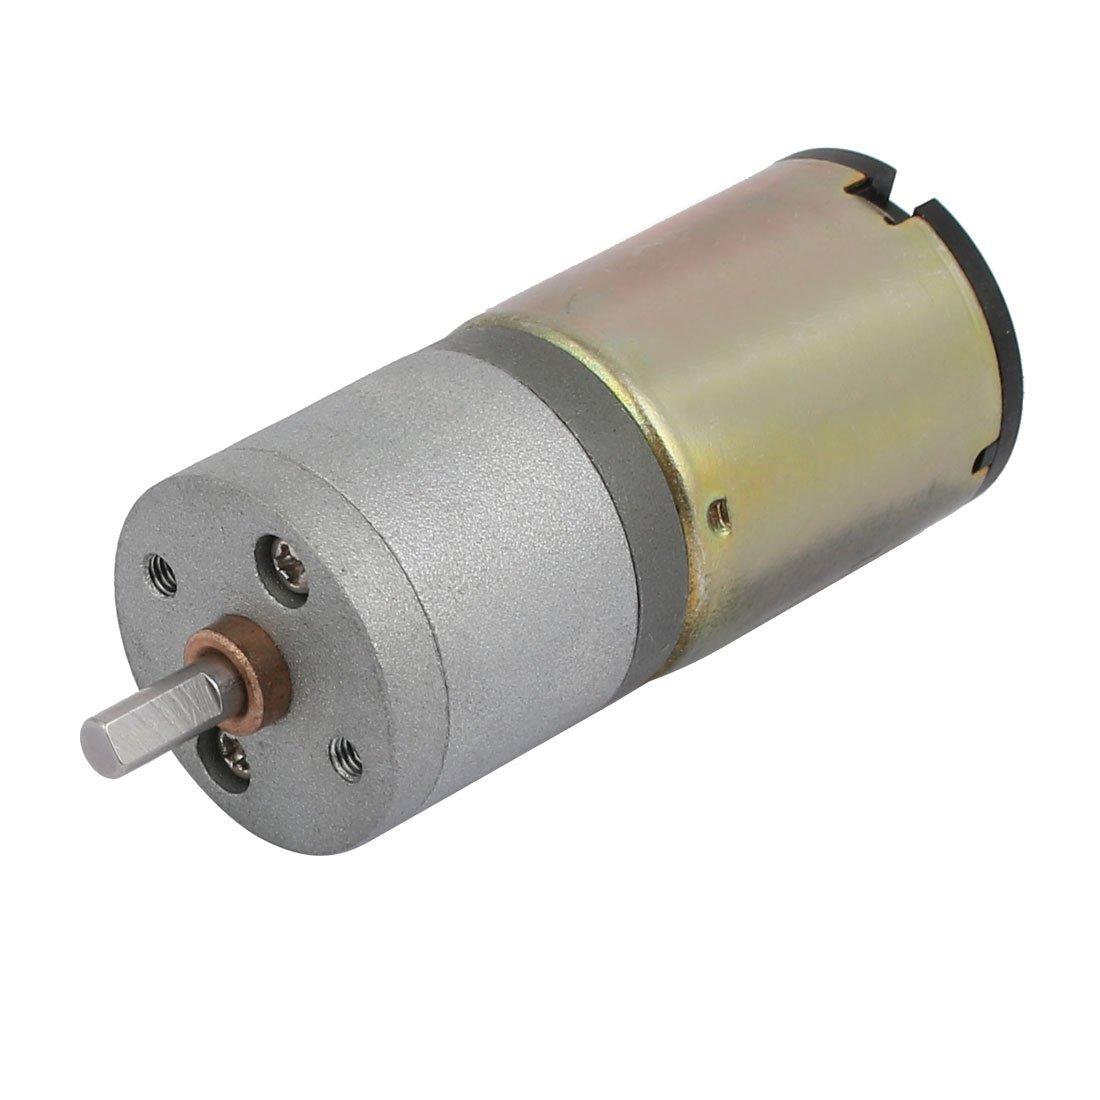 uxcell 25-372 Model DC24V 50RPM 9mmx4mm D Shaft DC Motor for RC Model Toy